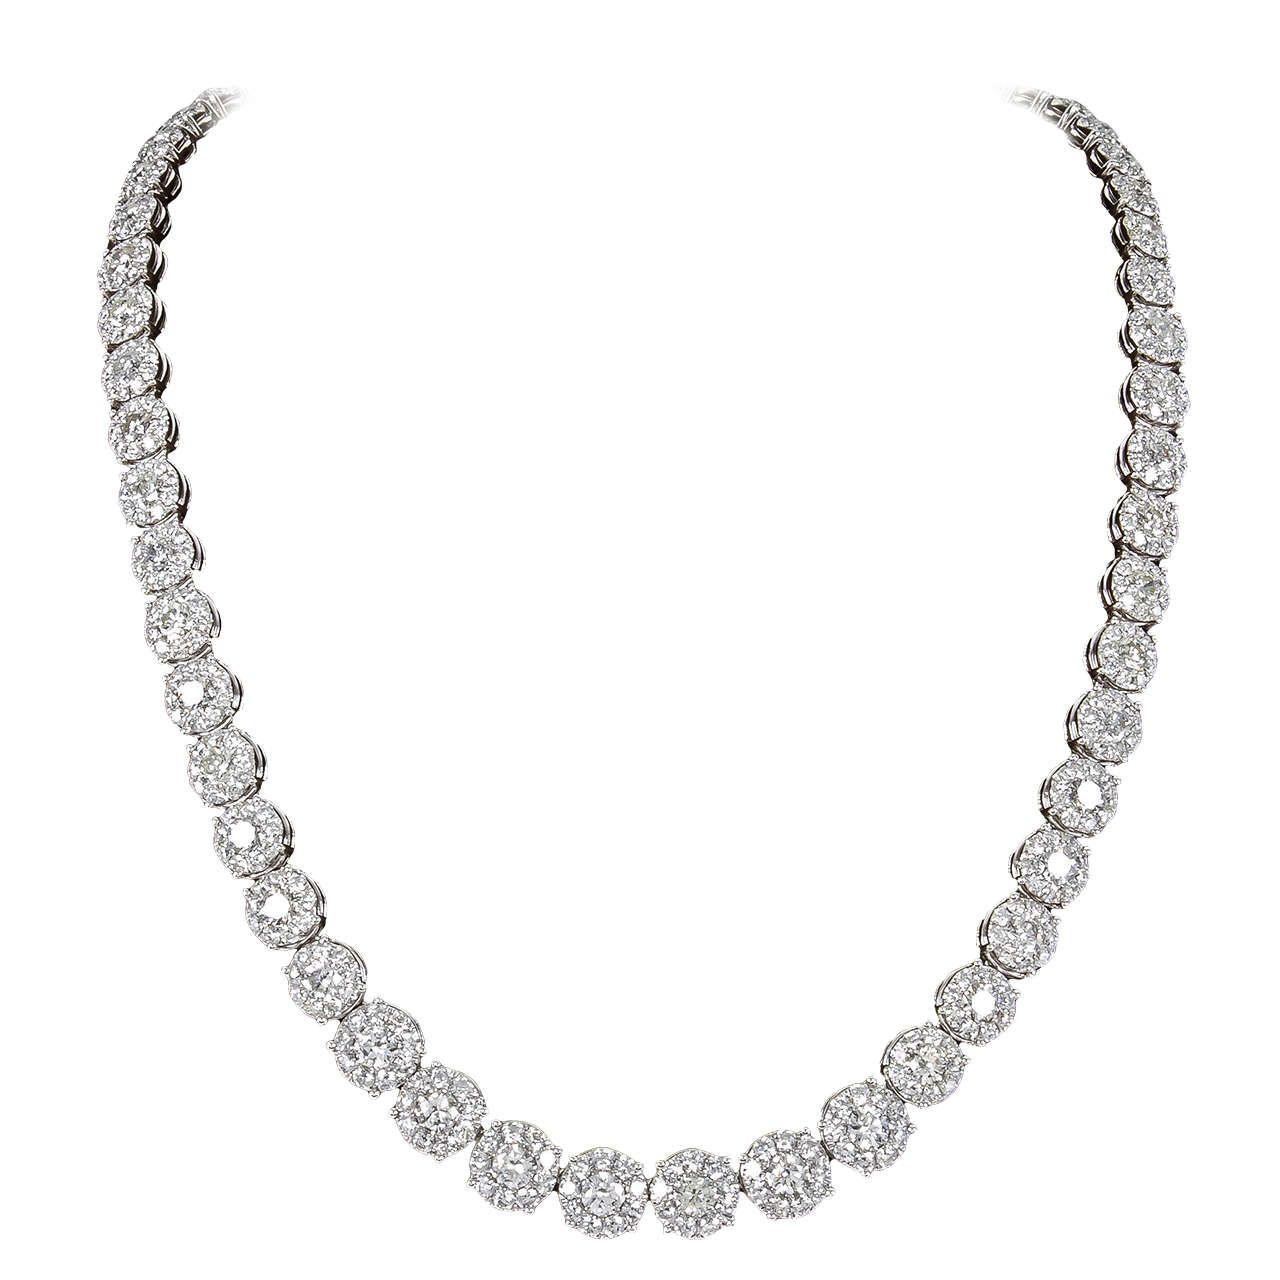 24 Carat Diamond Cluster Tennis Necklace Diamond Tennis Necklace Royal Jewelry